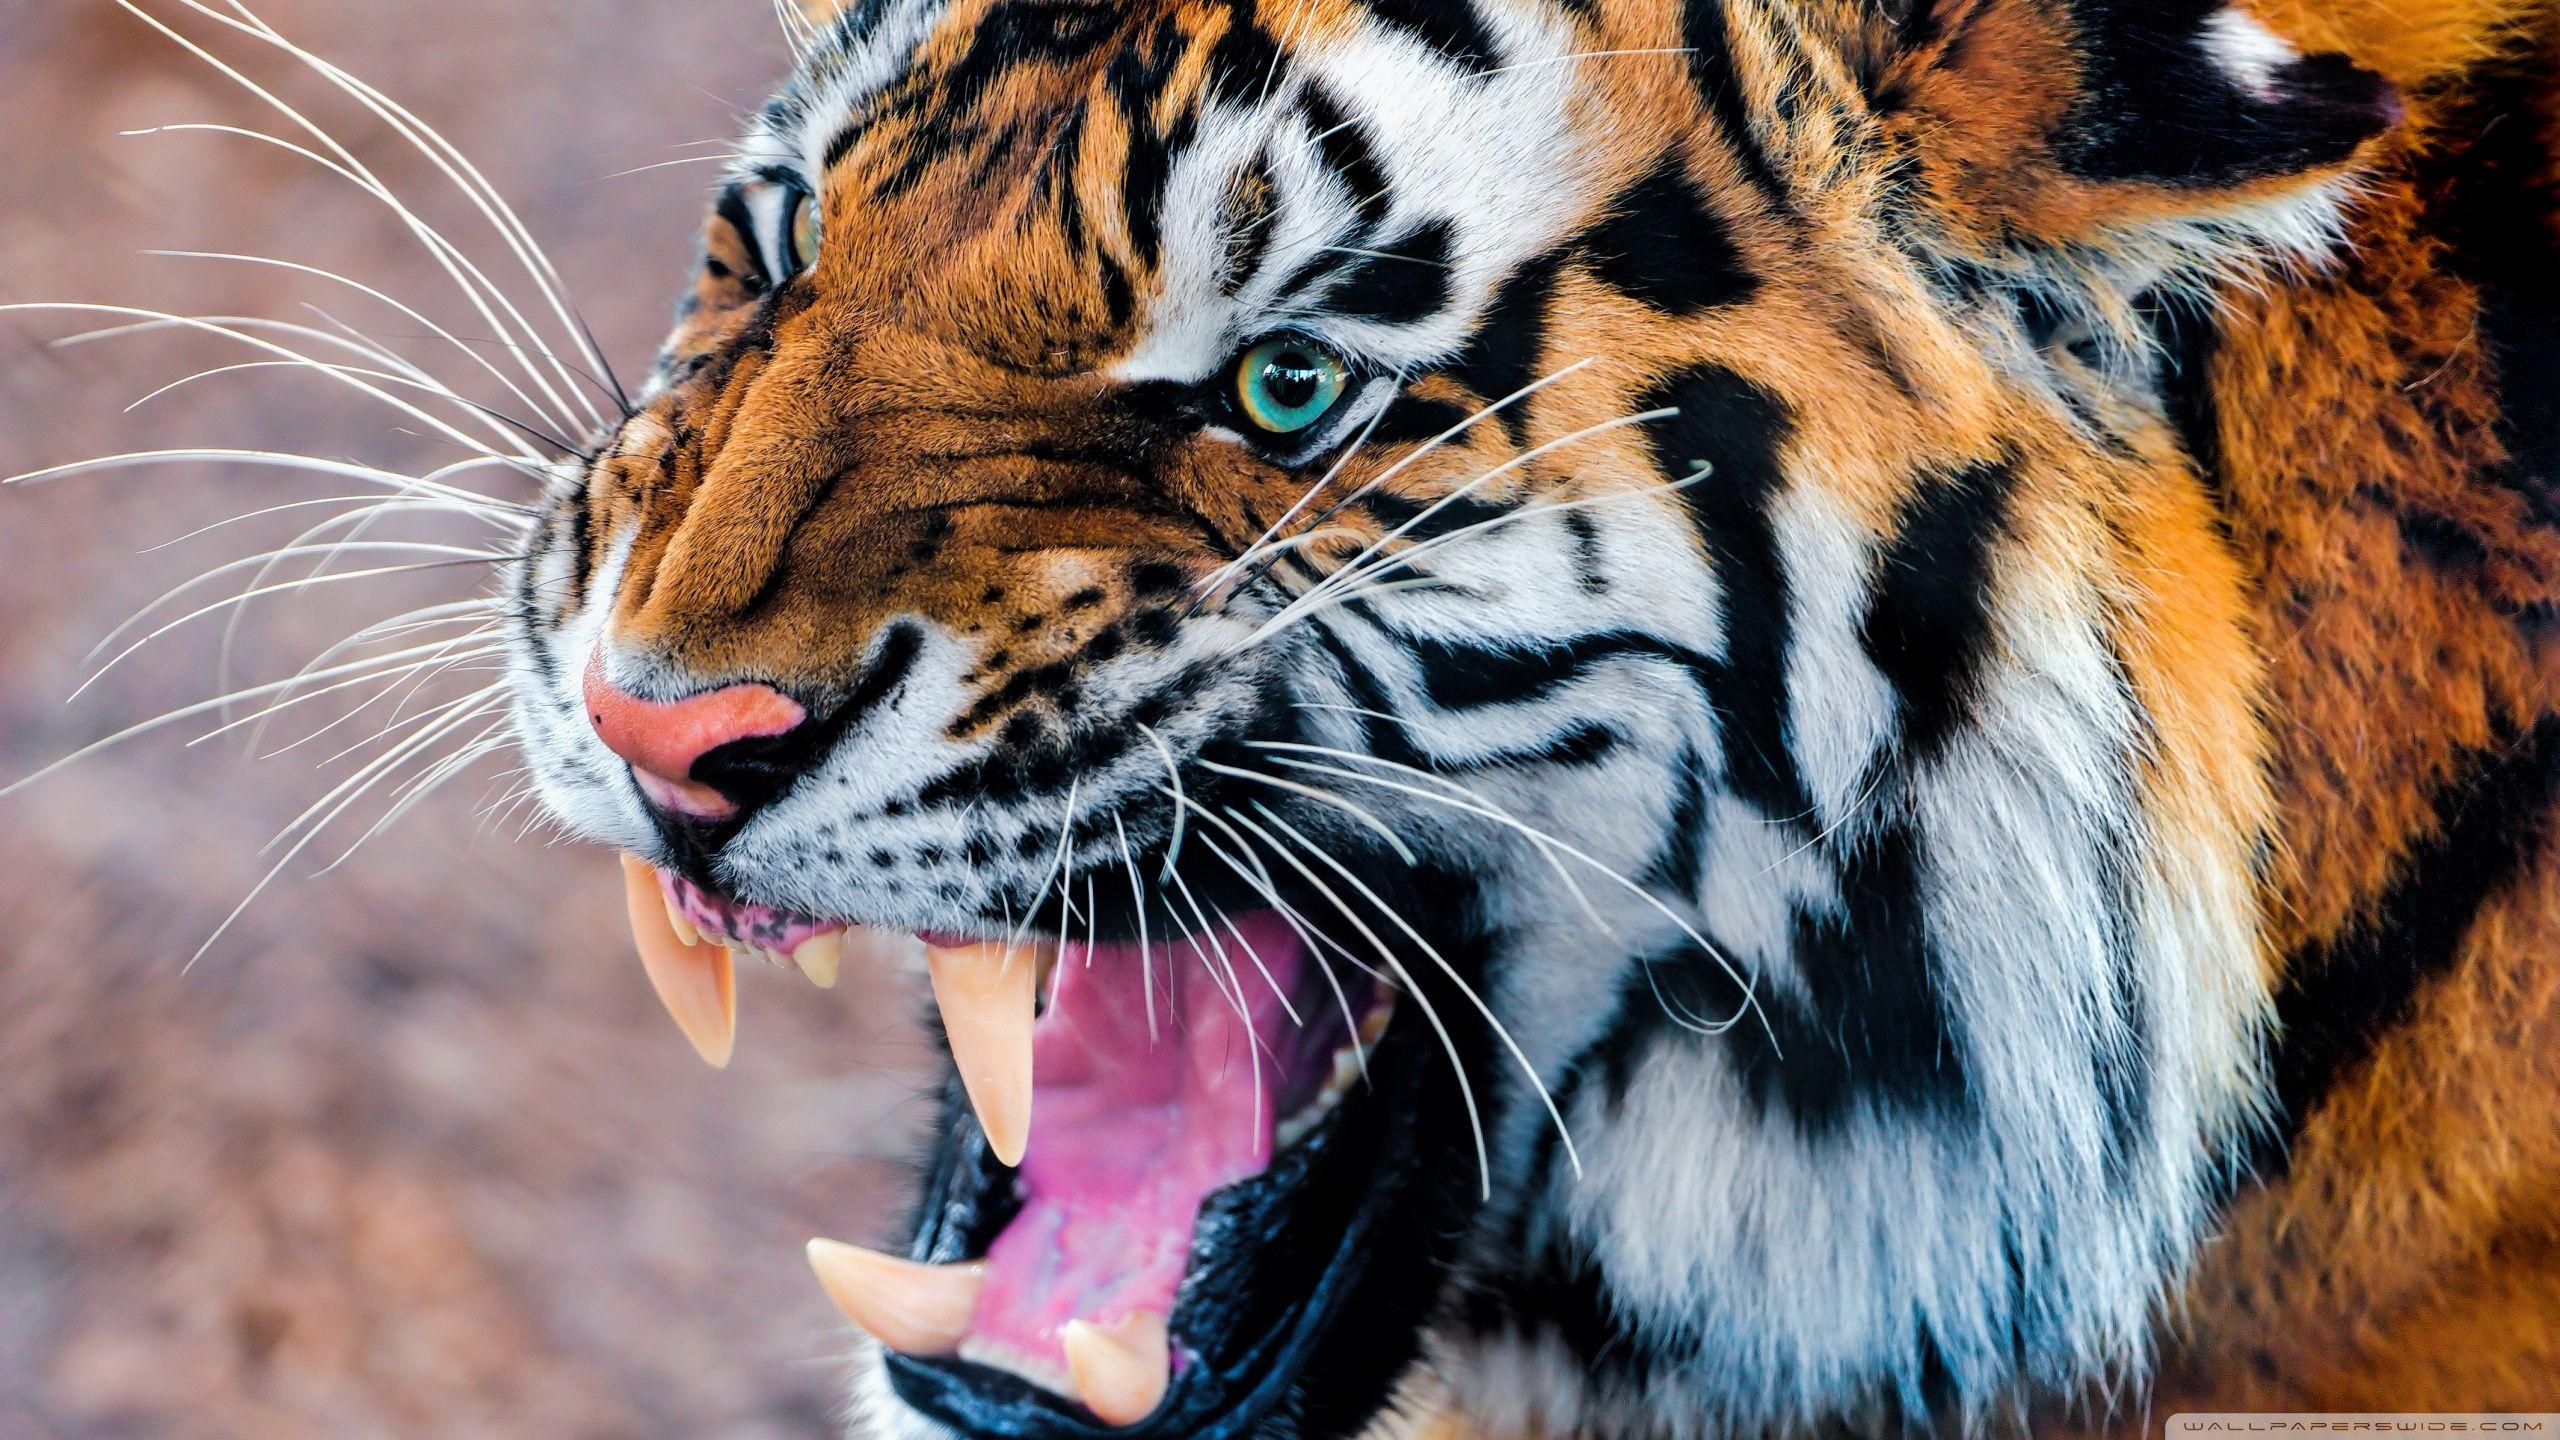 tiger wallpaper desktop | animals wallpapers | pinterest | tiger